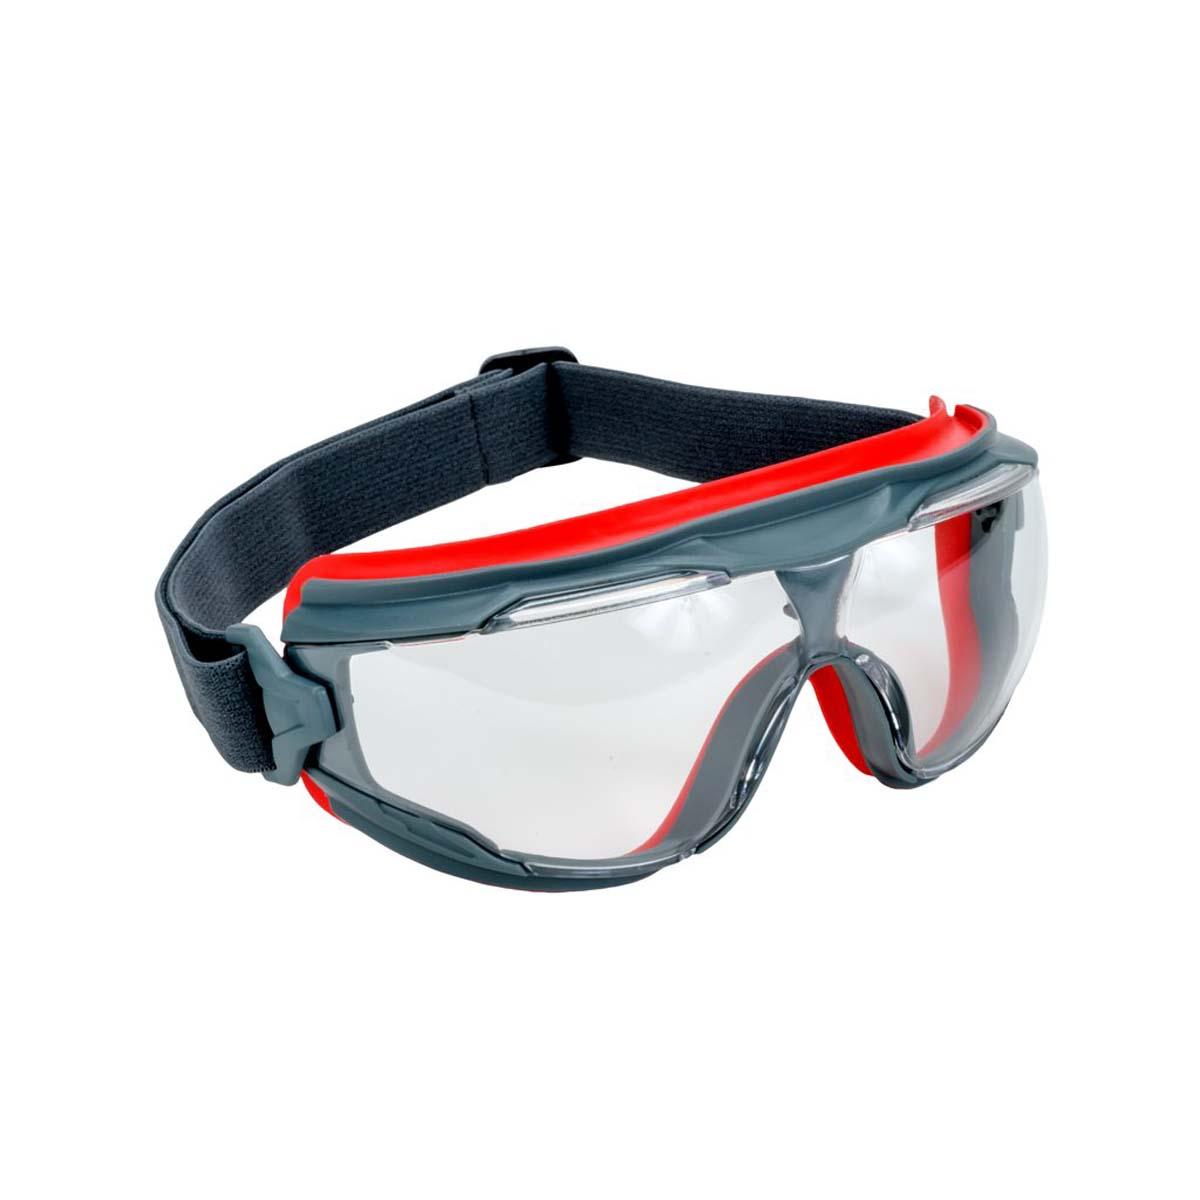 "3Mâ""¢ Goggle Gear 500-Series GG501SGAF, Clear Scotchgardâ""¢ Anti-fog lens"